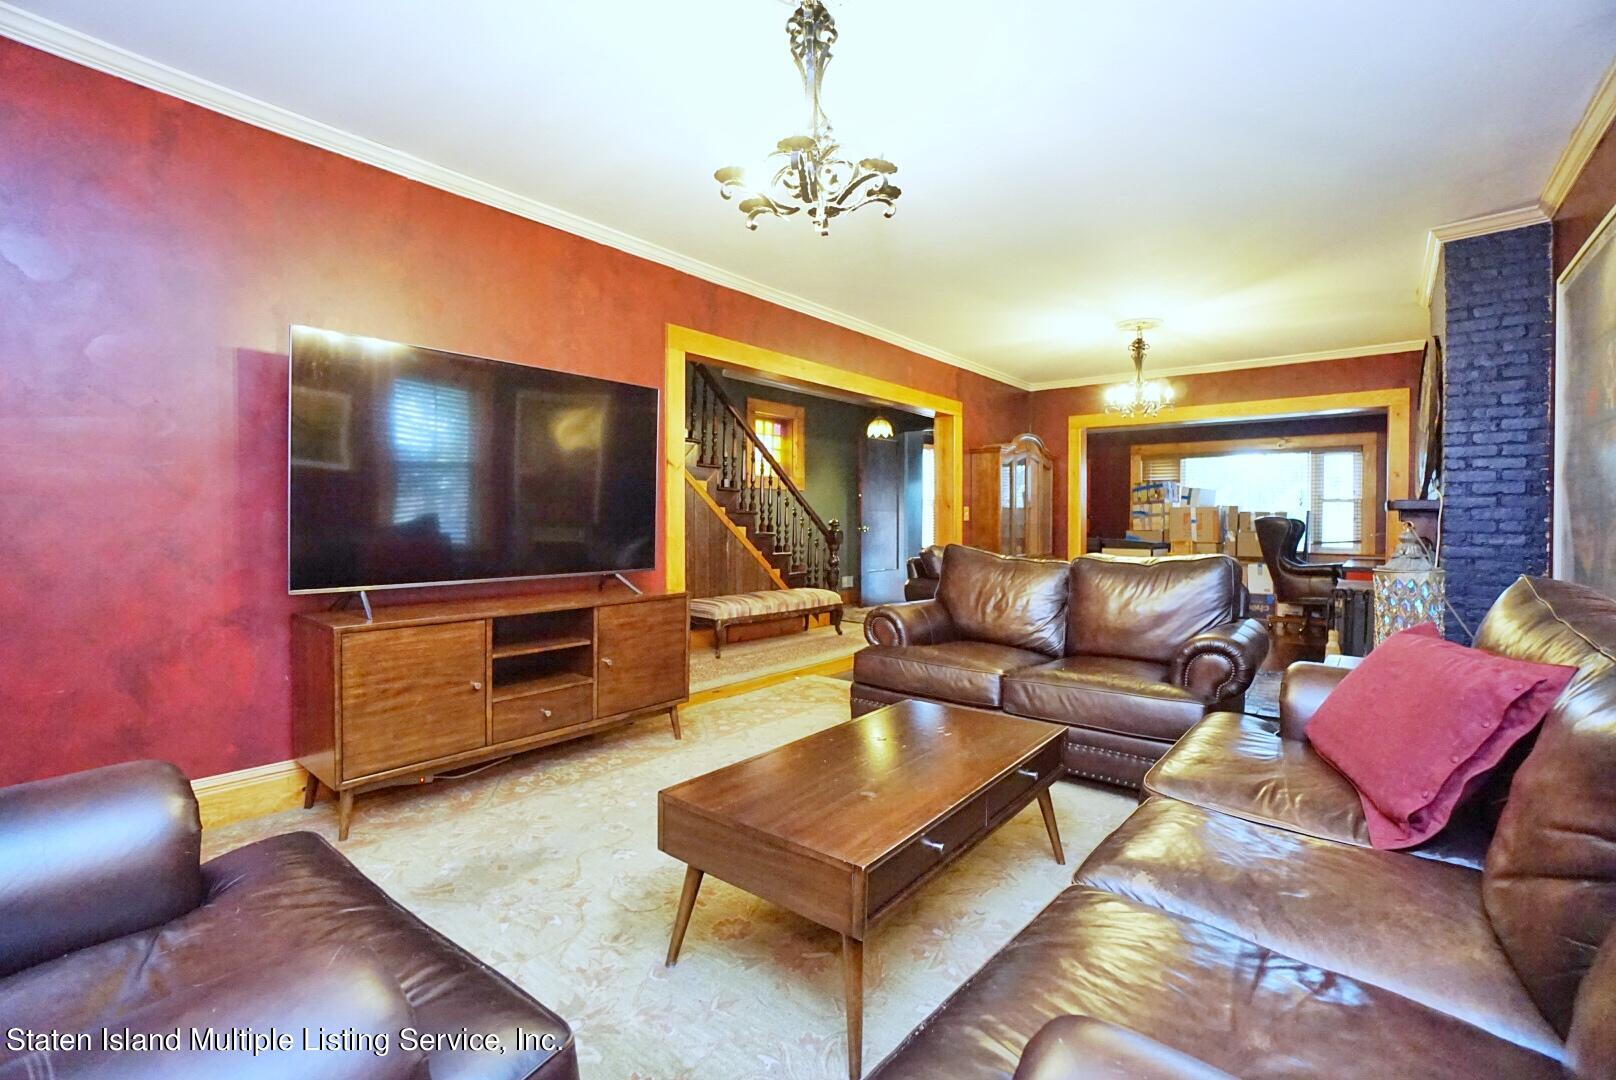 Single Family - Detached 136 York Avenue  Staten Island, NY 10301, MLS-1147575-11